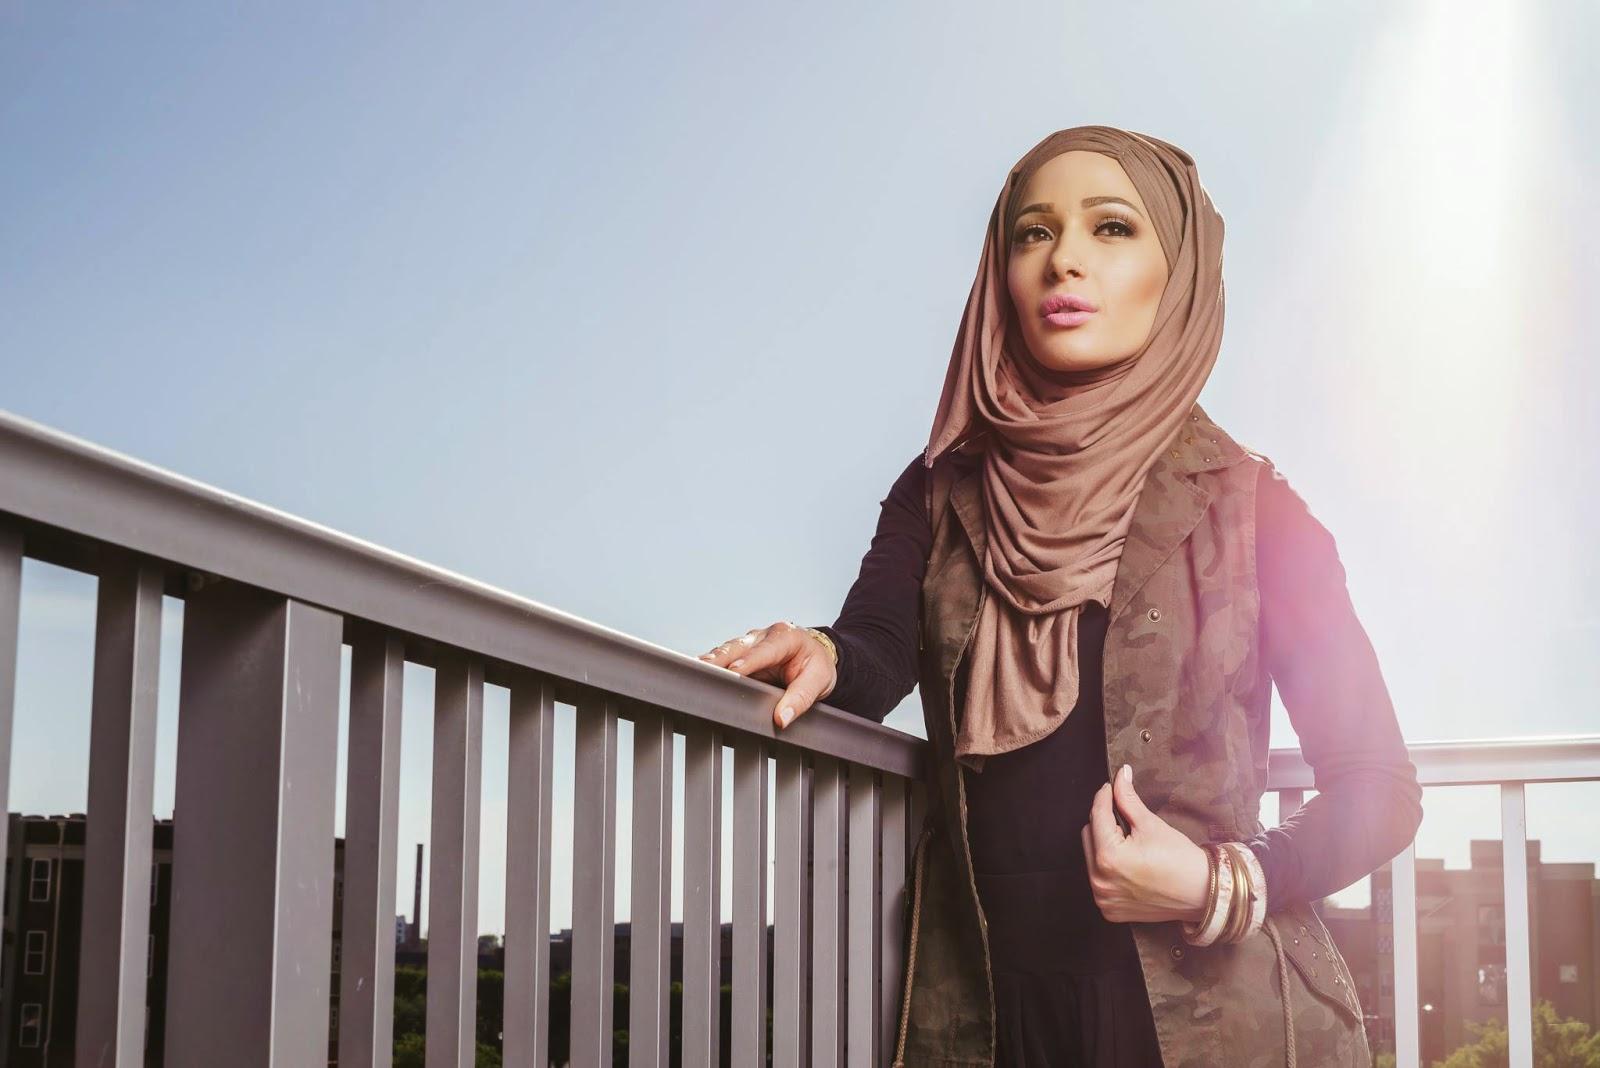 Hijab moderne idee tenue hijab hiver hijab et voile mode style mariage et fashion dans l 39 islam - Idee tenue hiver ...